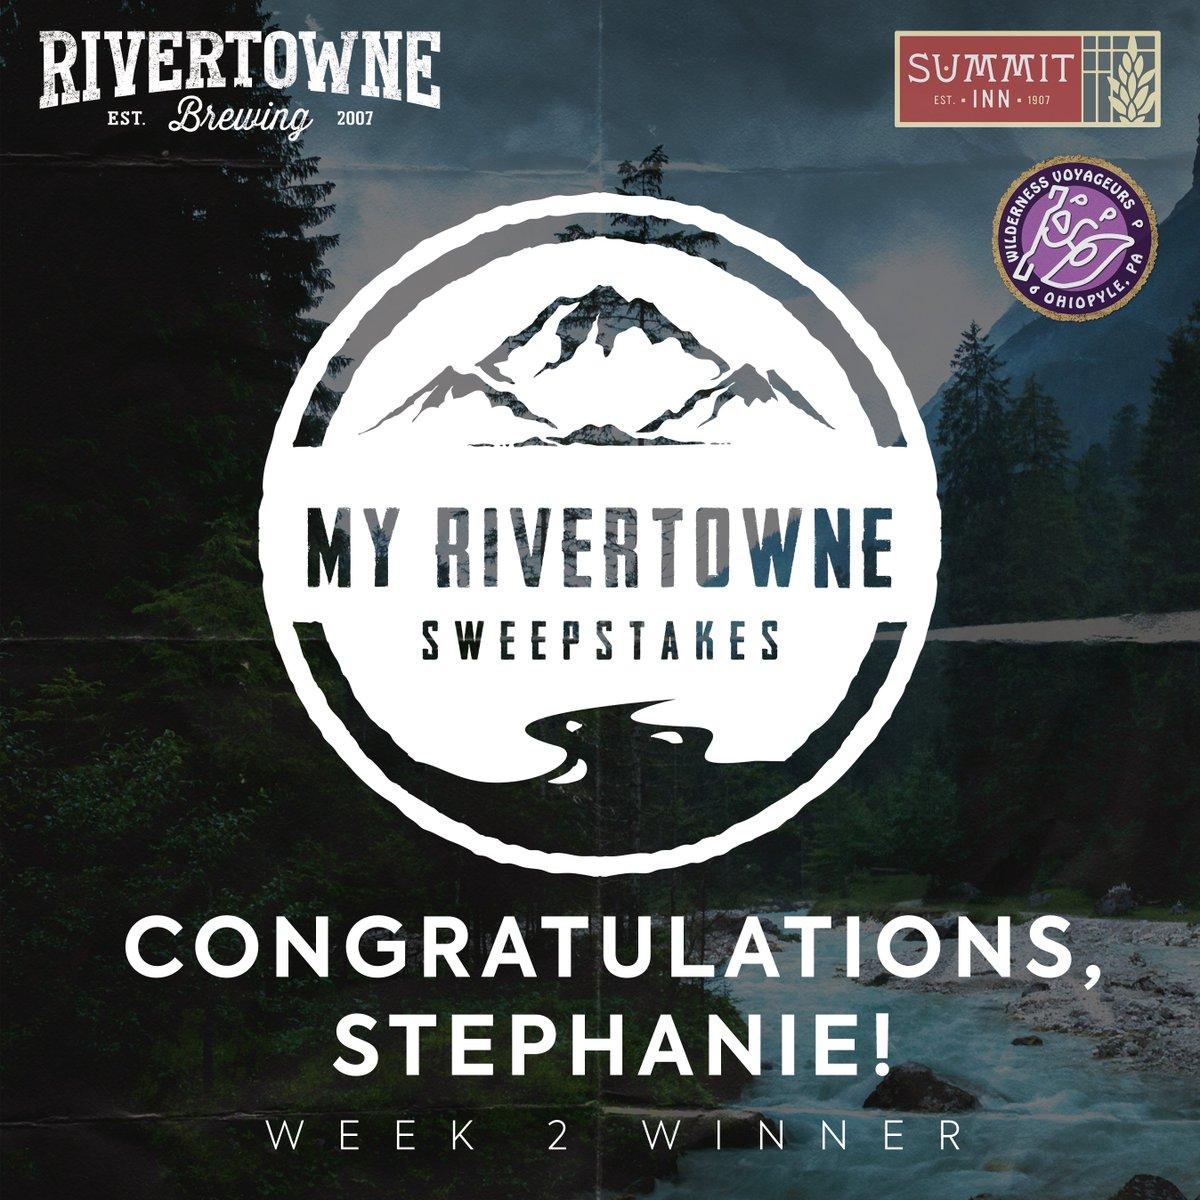 Rivertowne Brewing (@rivertownebeer) | Twitter